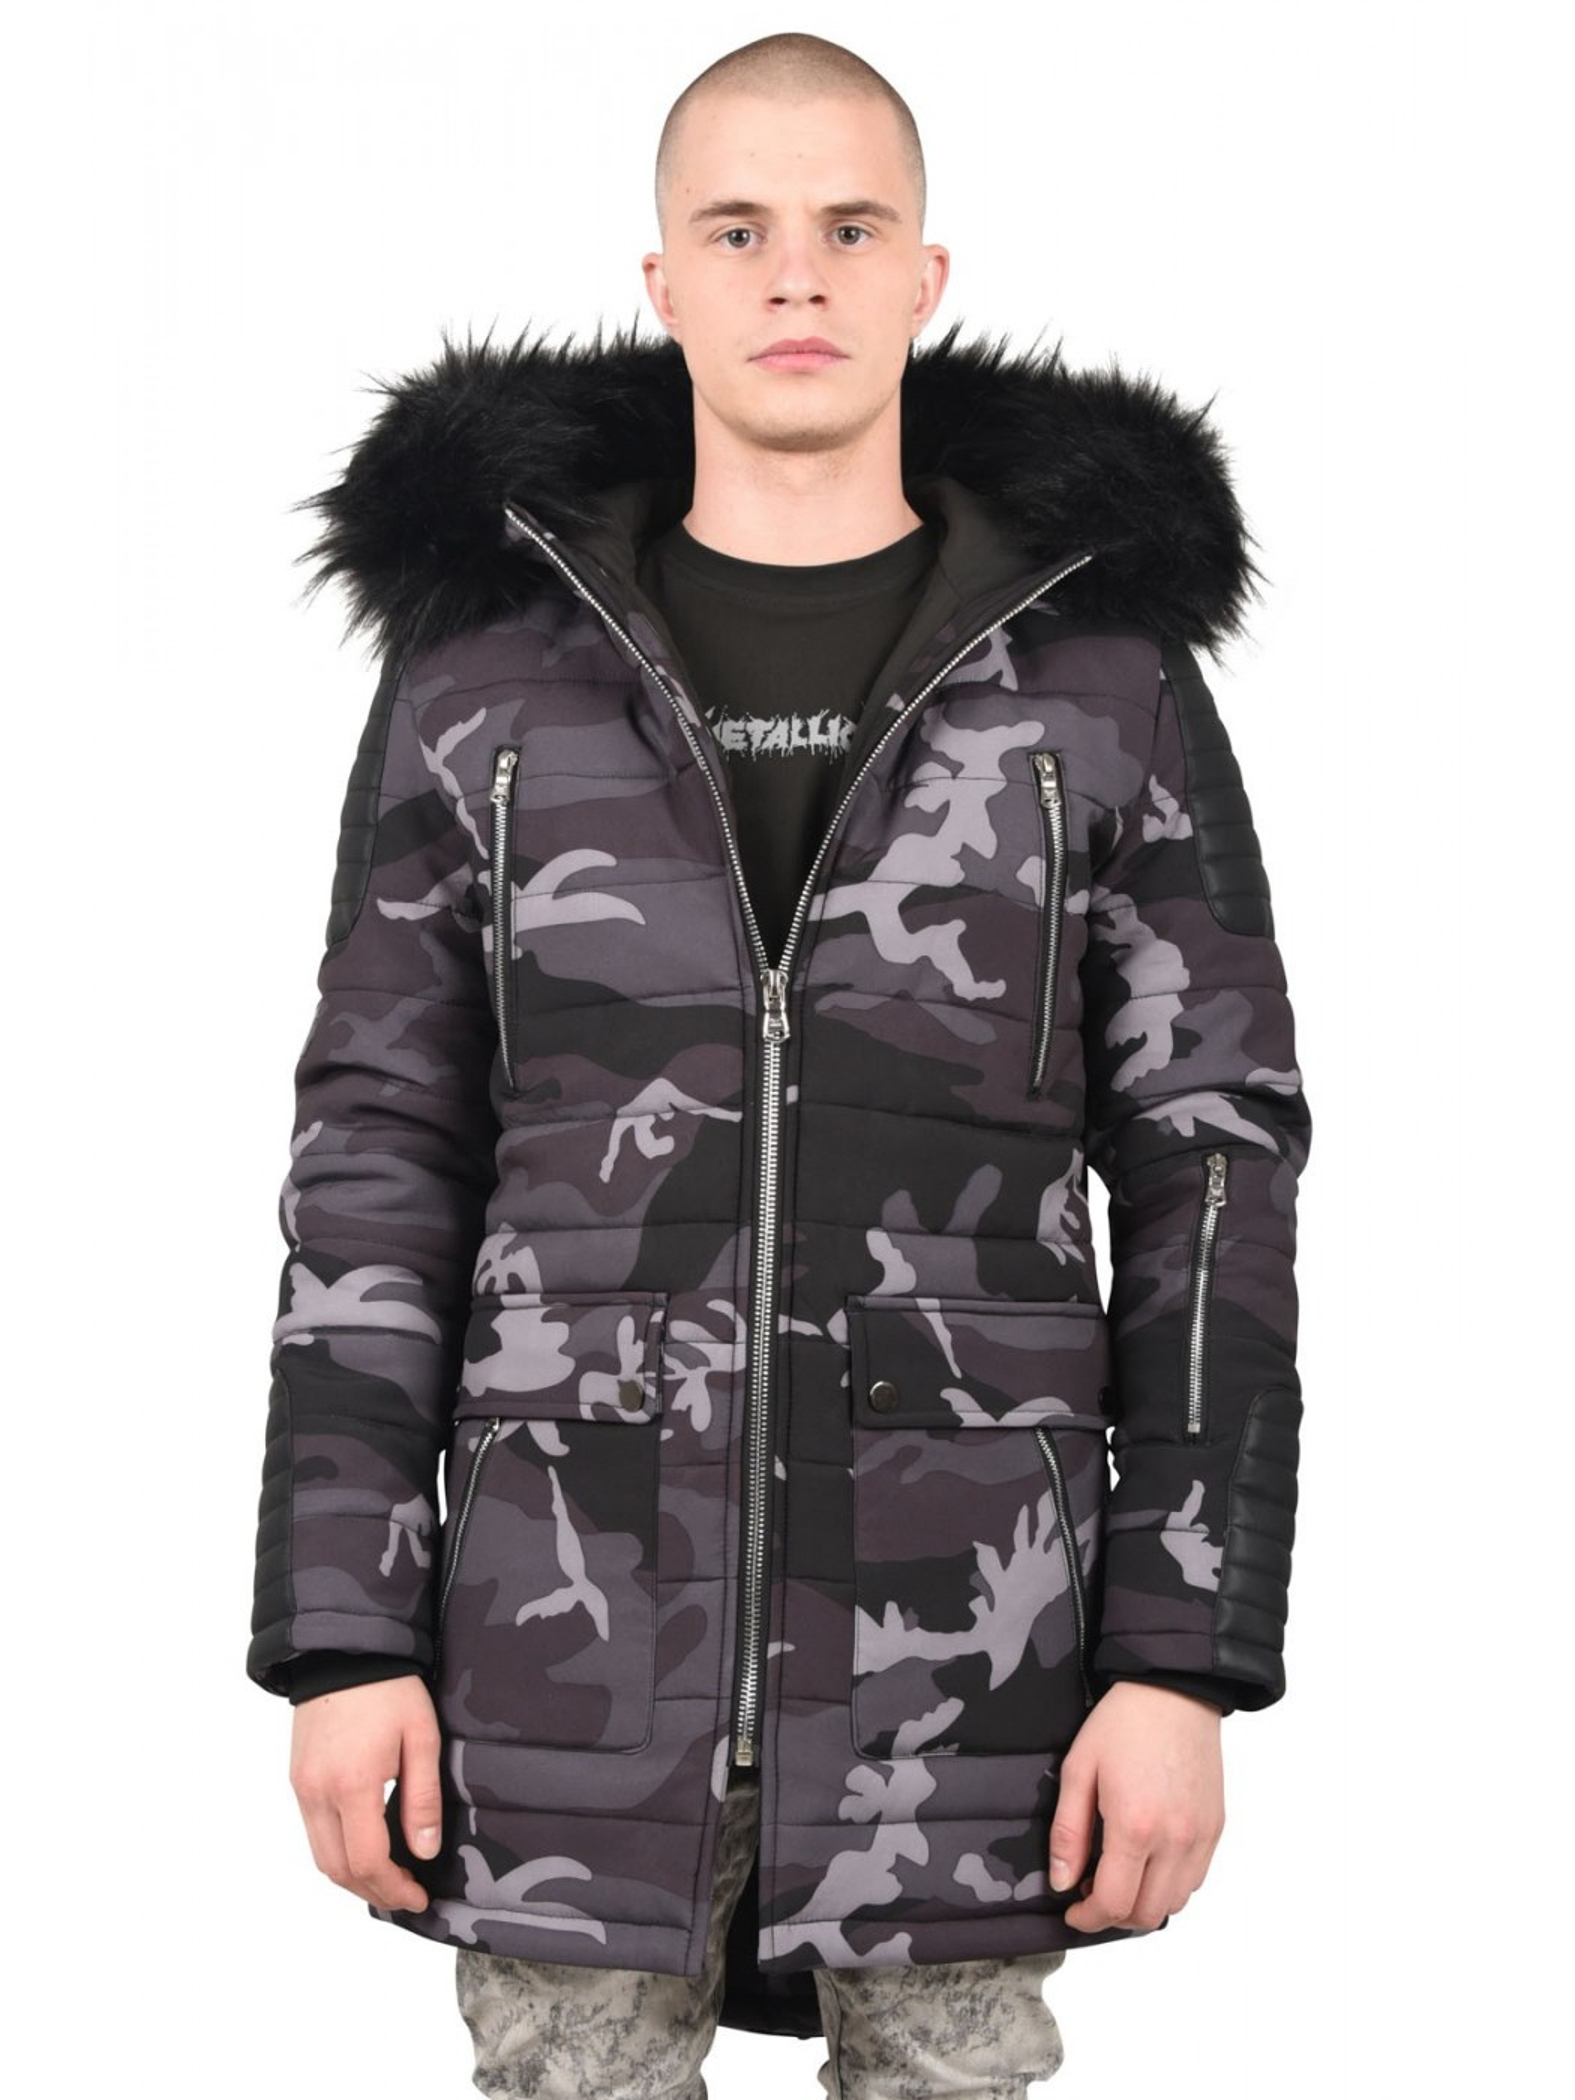 30b3bfedf0d57 Men's Parka Jacket with Camo Print Project X Paris